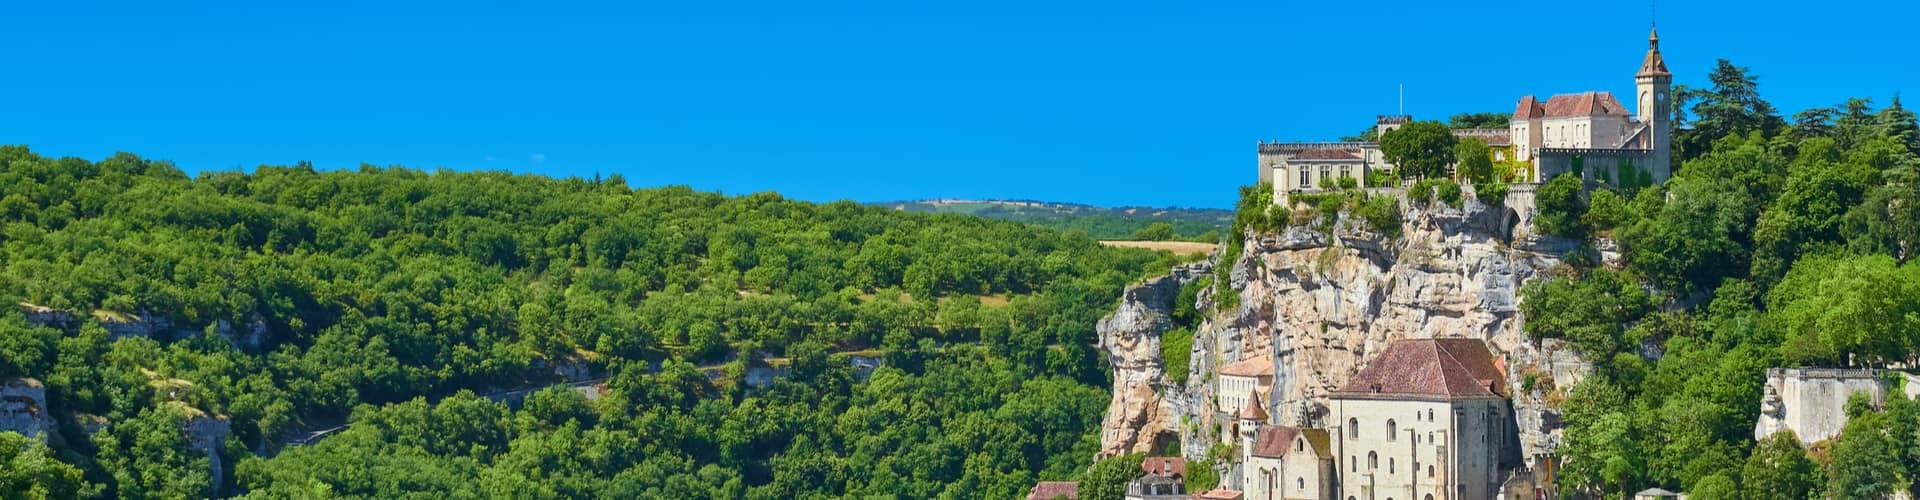 Kamperen in Occitanië